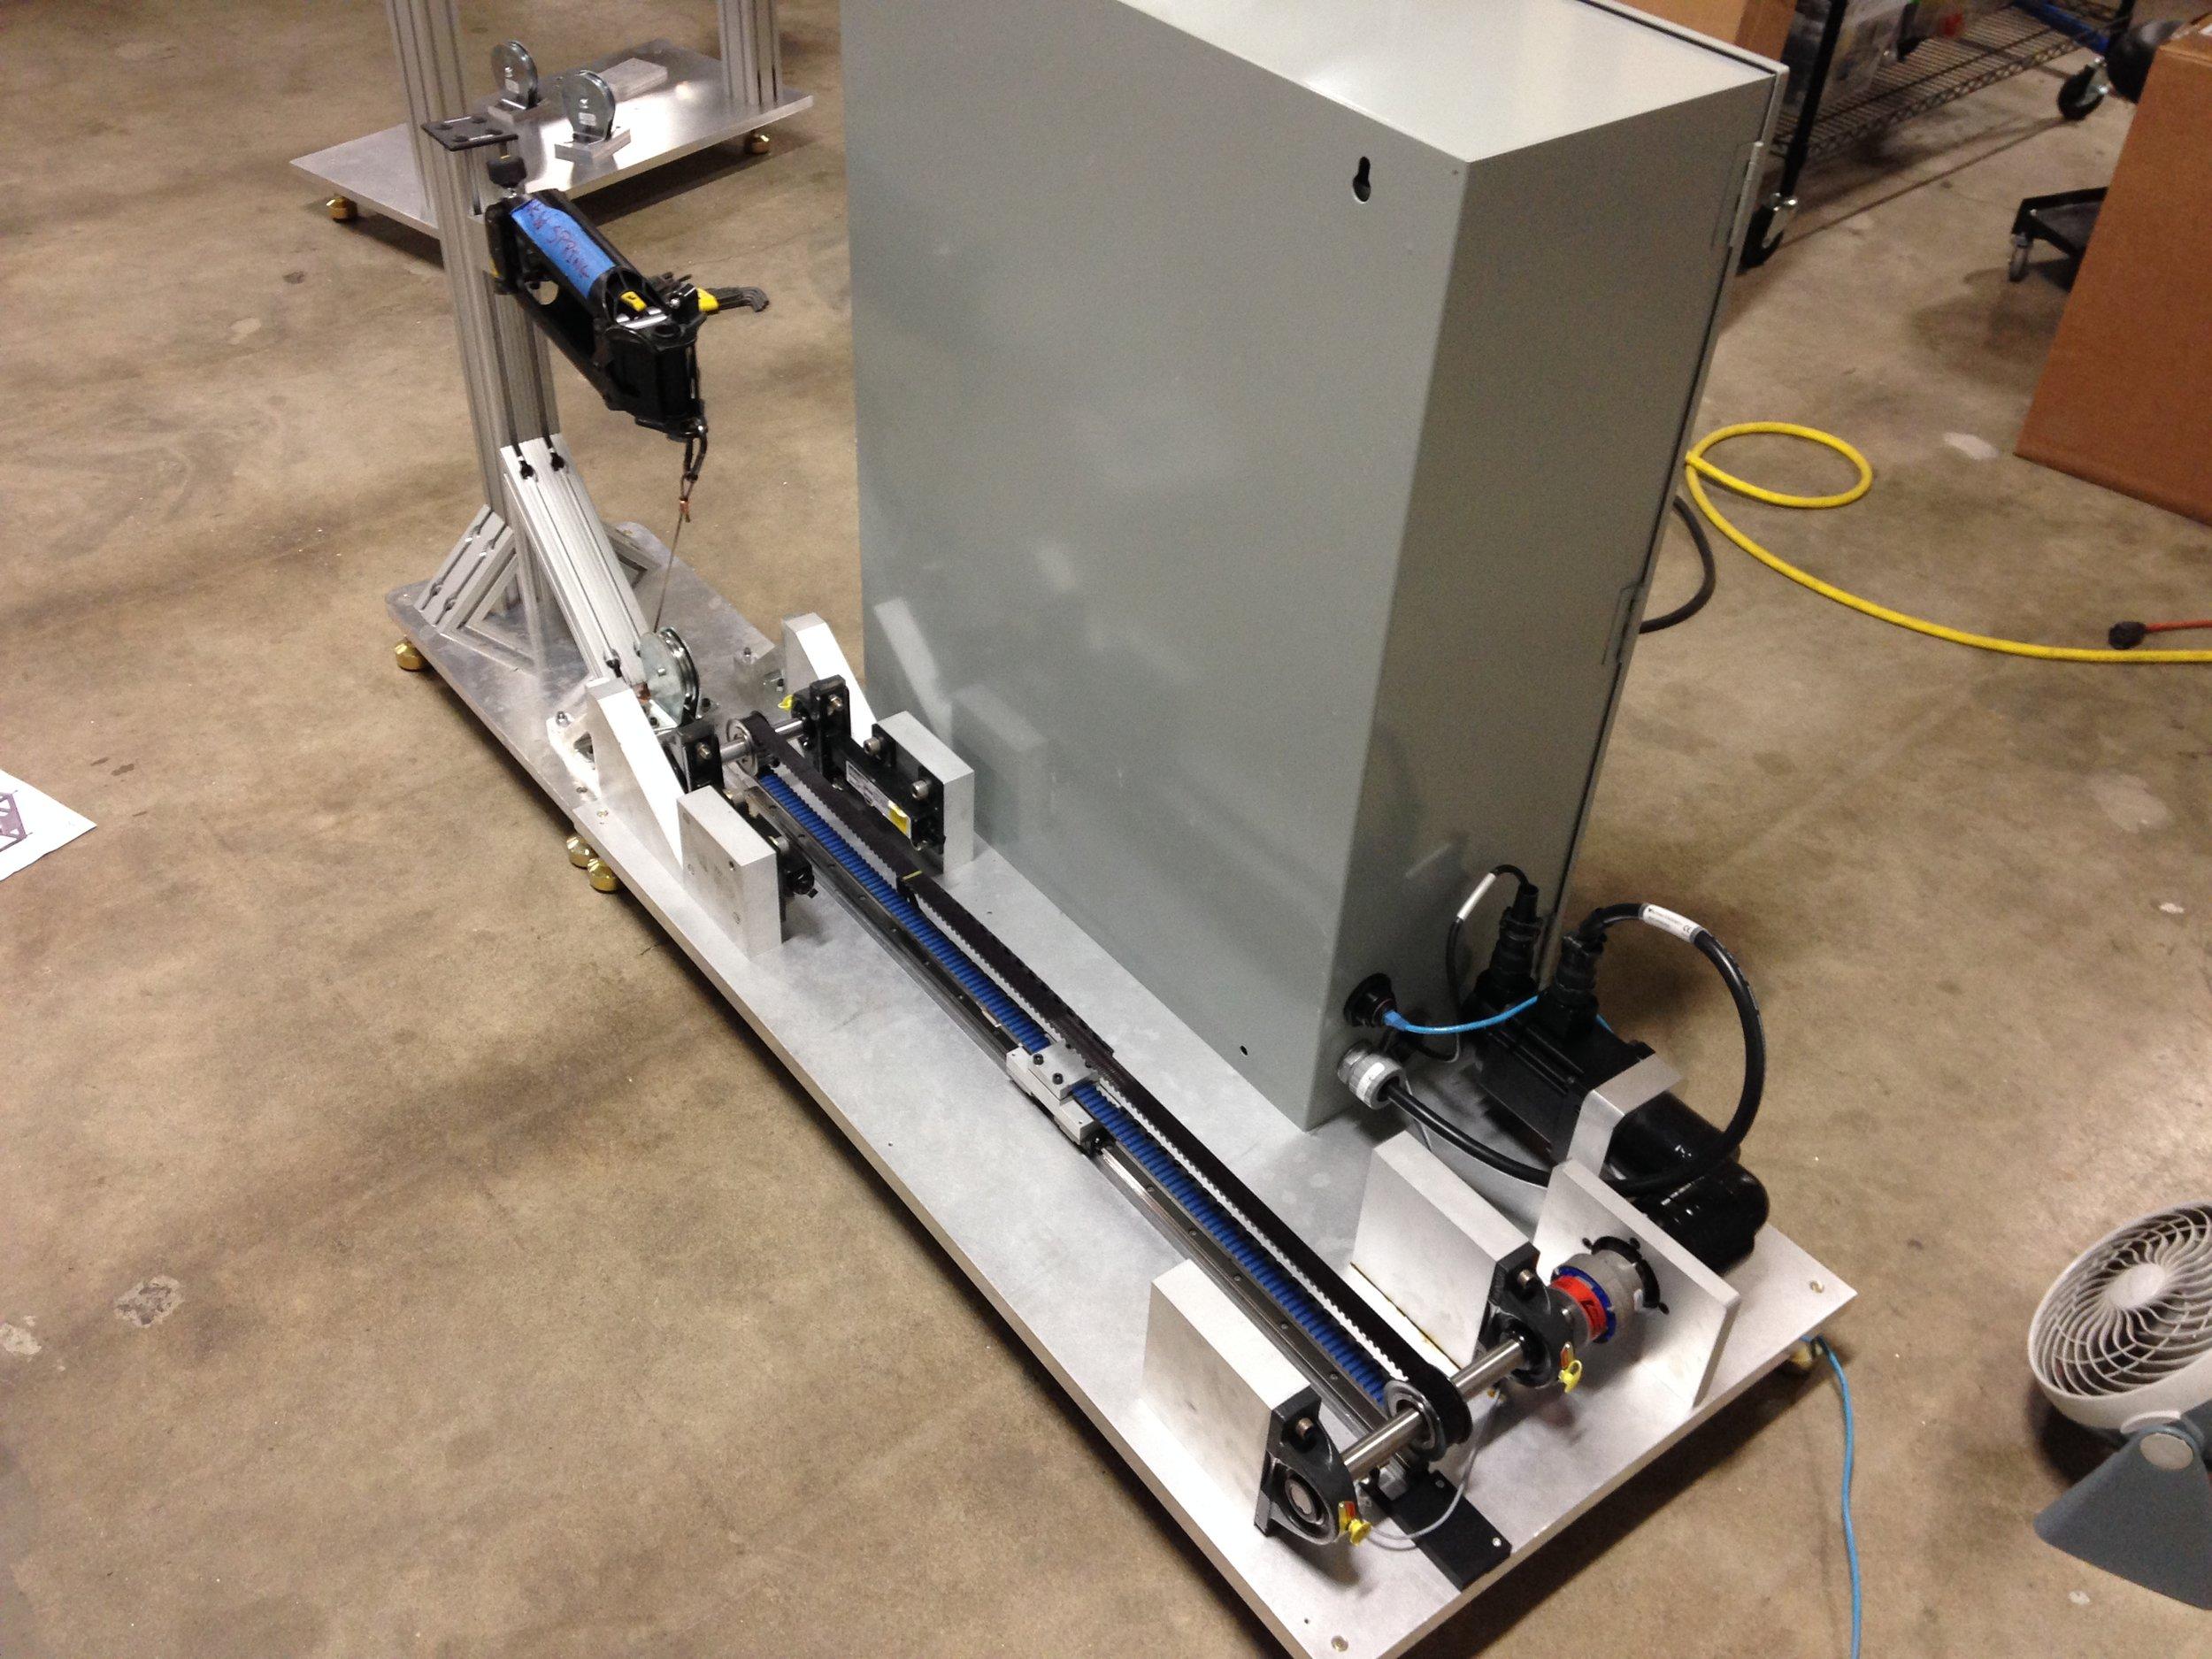 Modular Environmental Test Fixture for the Ekso ZeroG System